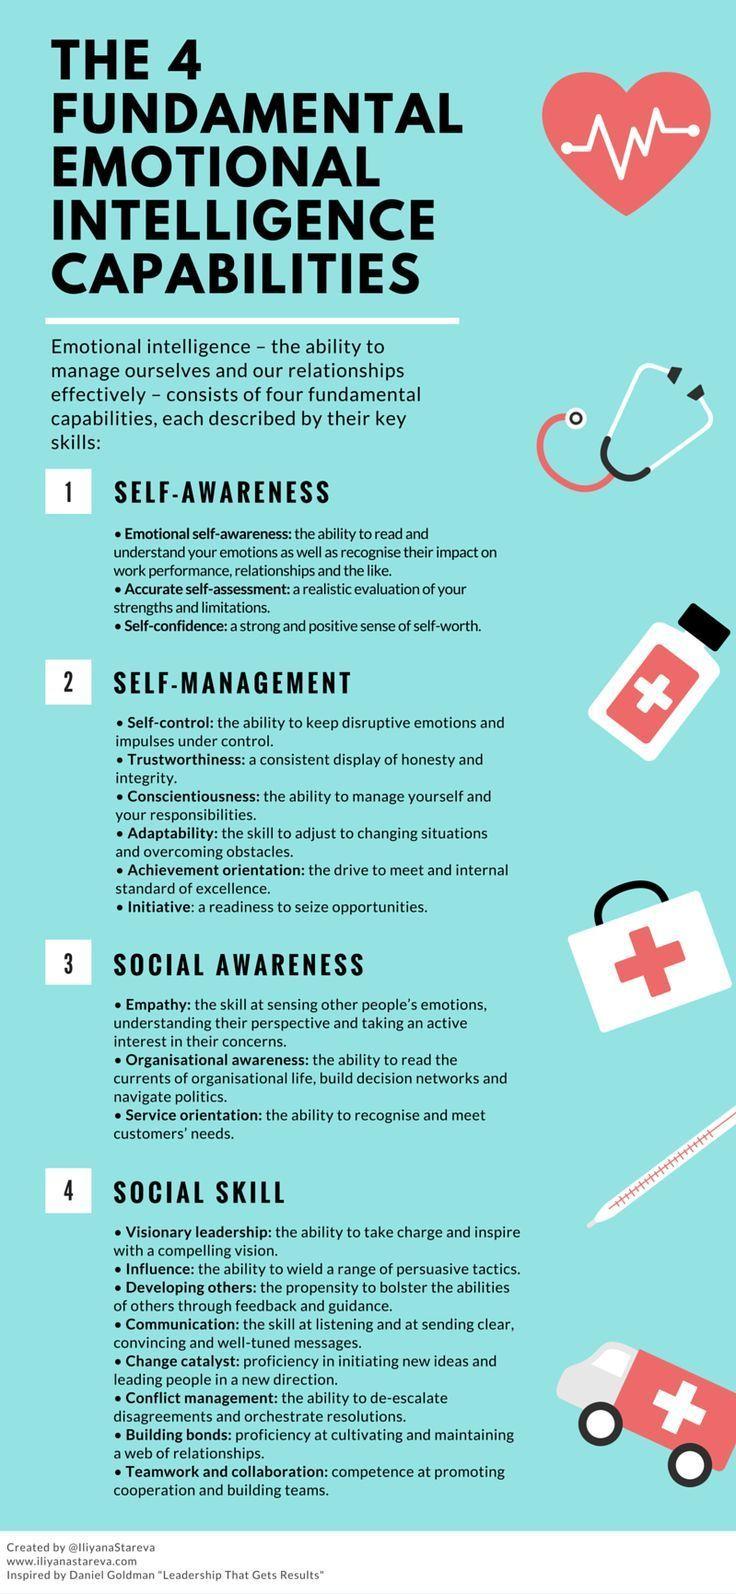 The 4 Key Emotional Intelligence Capabilities Infographic